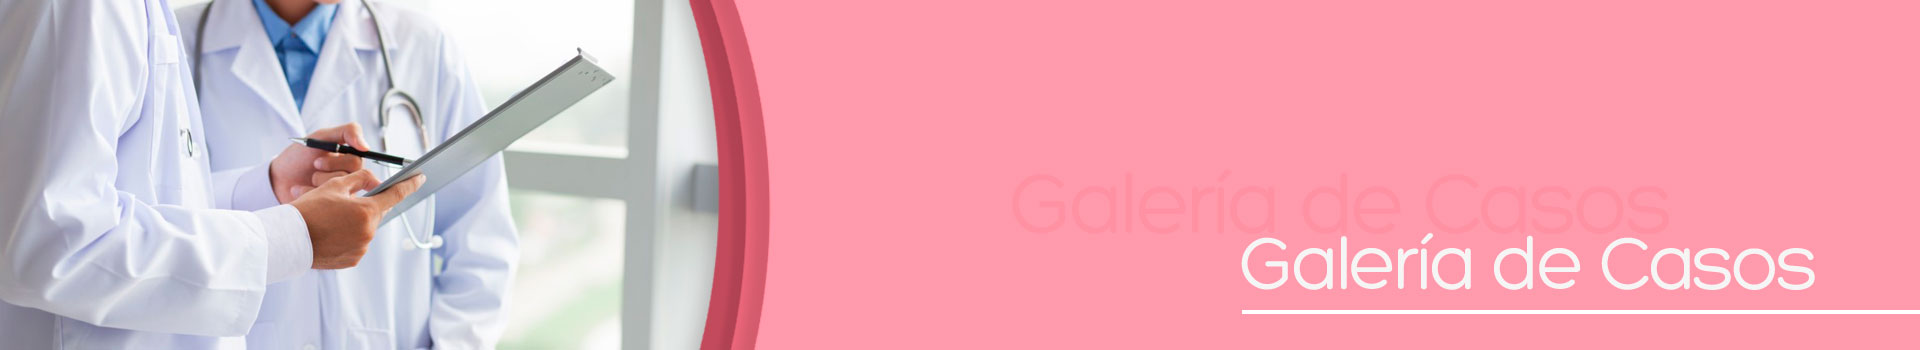 banner-galeria-de-casos